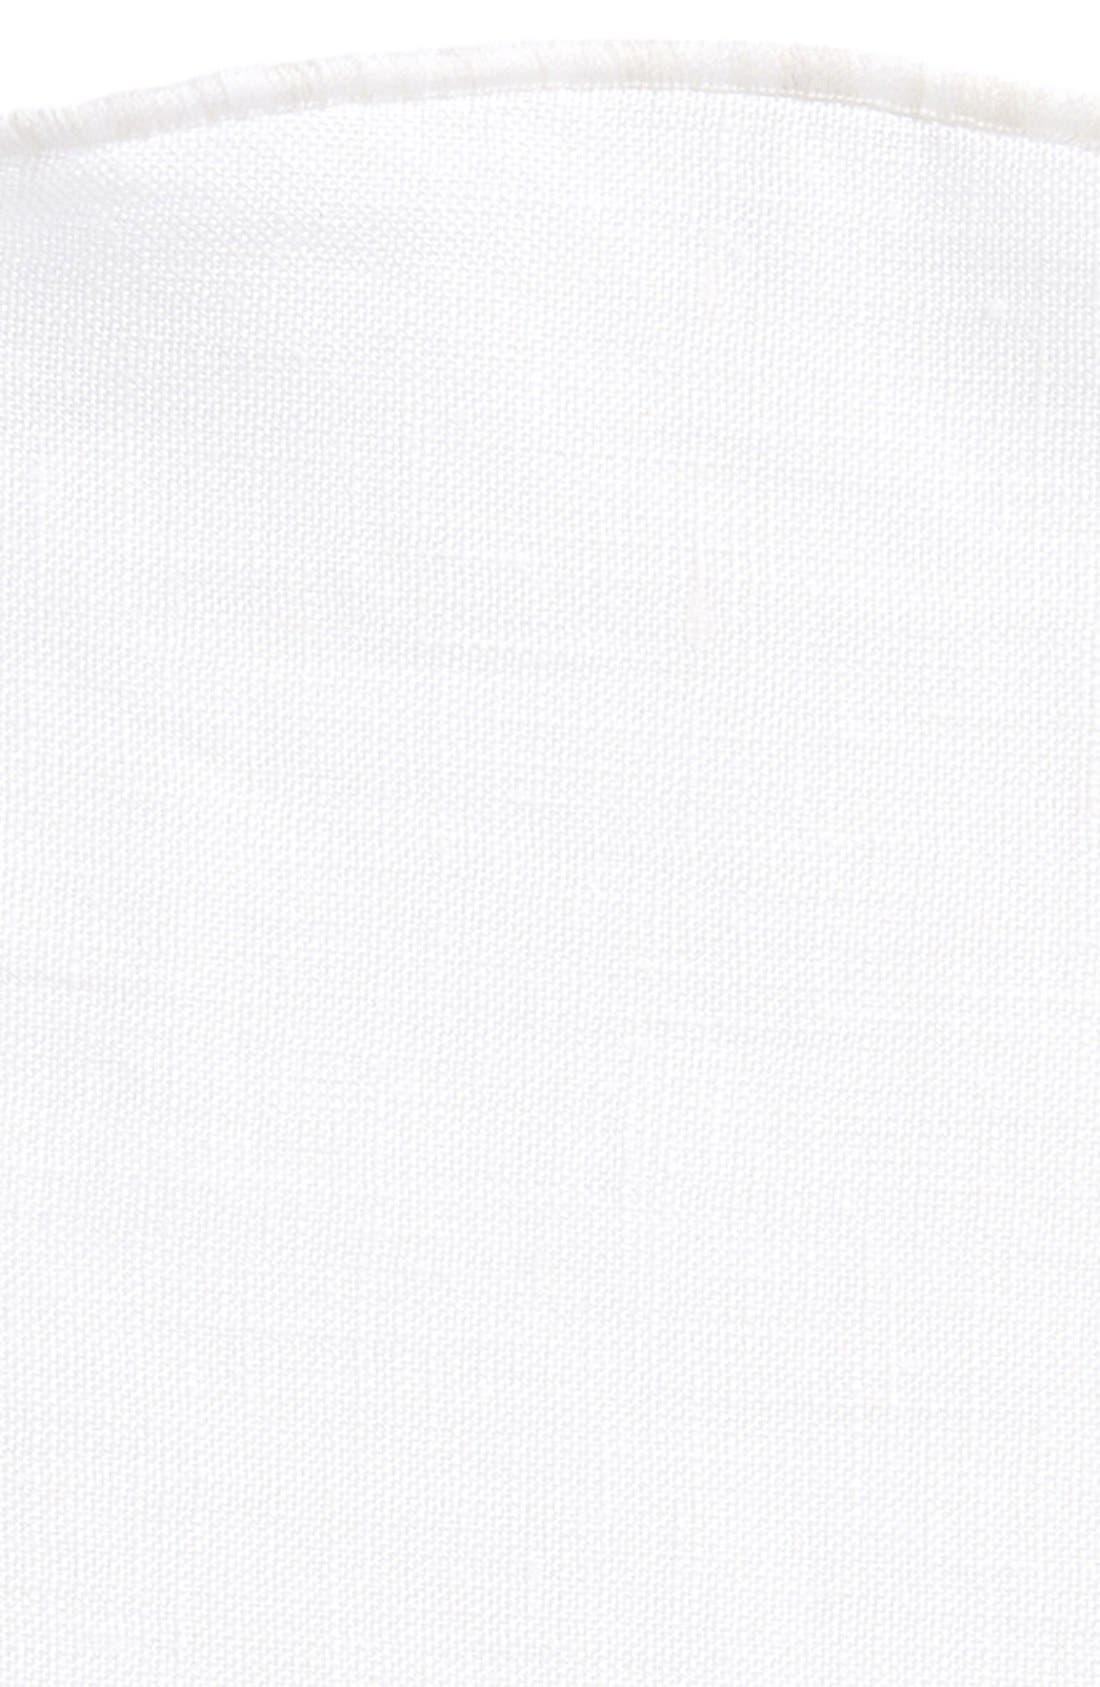 Linen Pocket Round,                             Alternate thumbnail 3, color,                             100